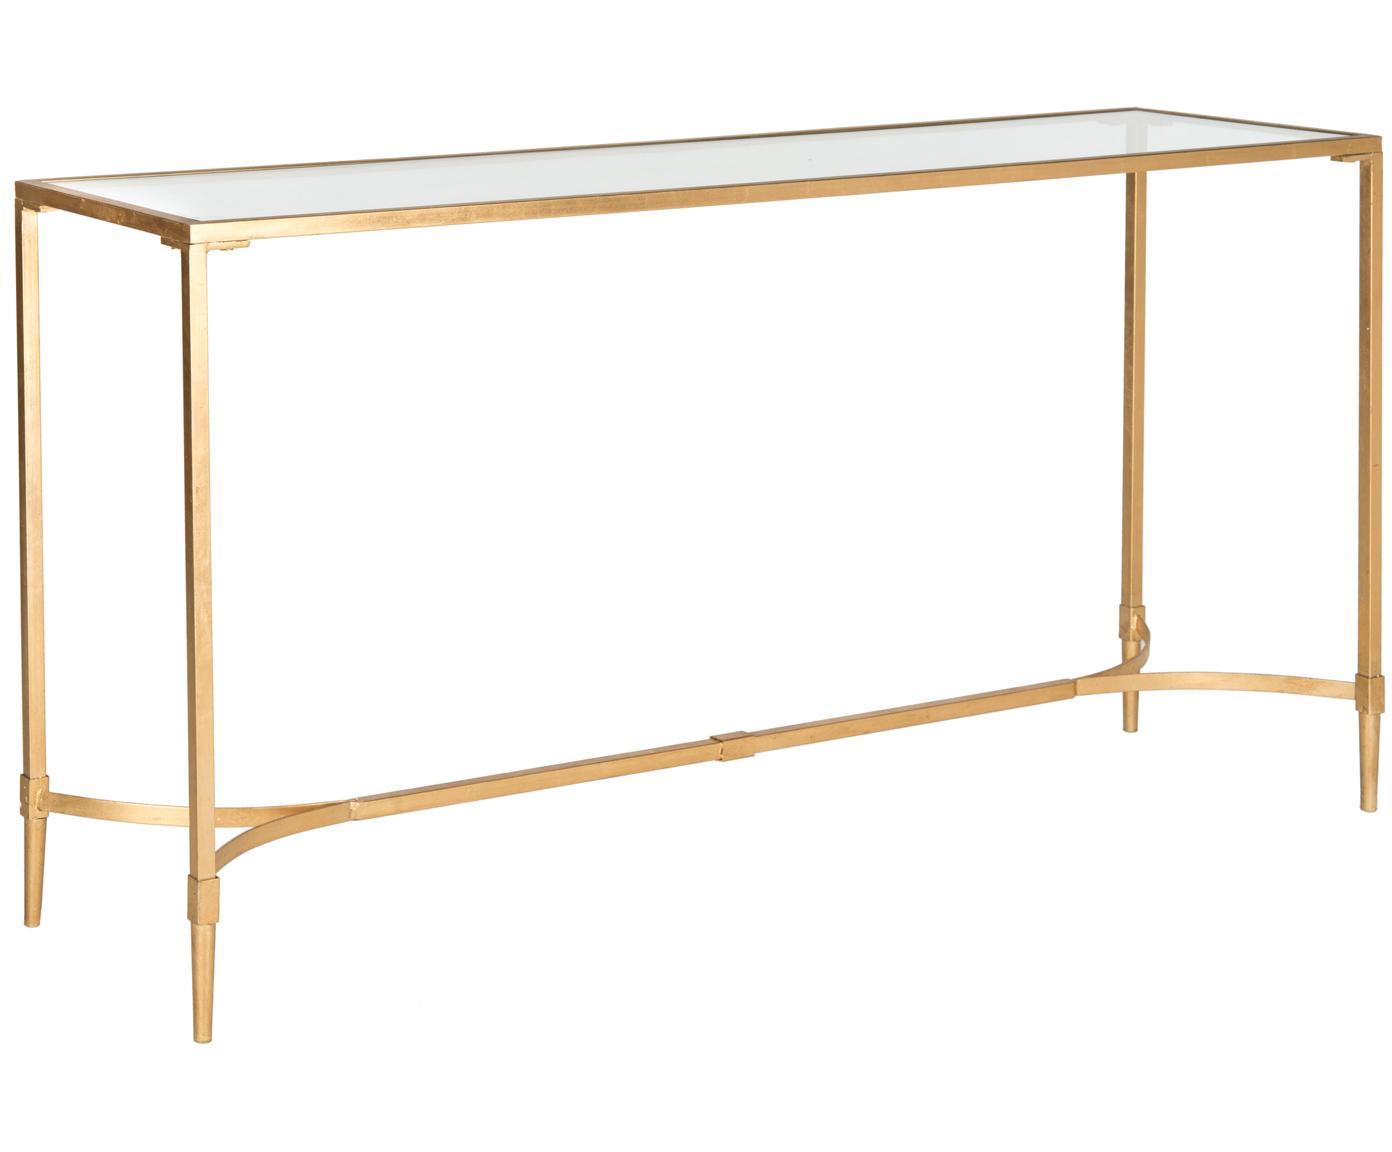 Sidetable Abigail, Frame: gelakt ijzer, Tafelblad: glas, Goudkleurig, transparant, 160 x 81 cm